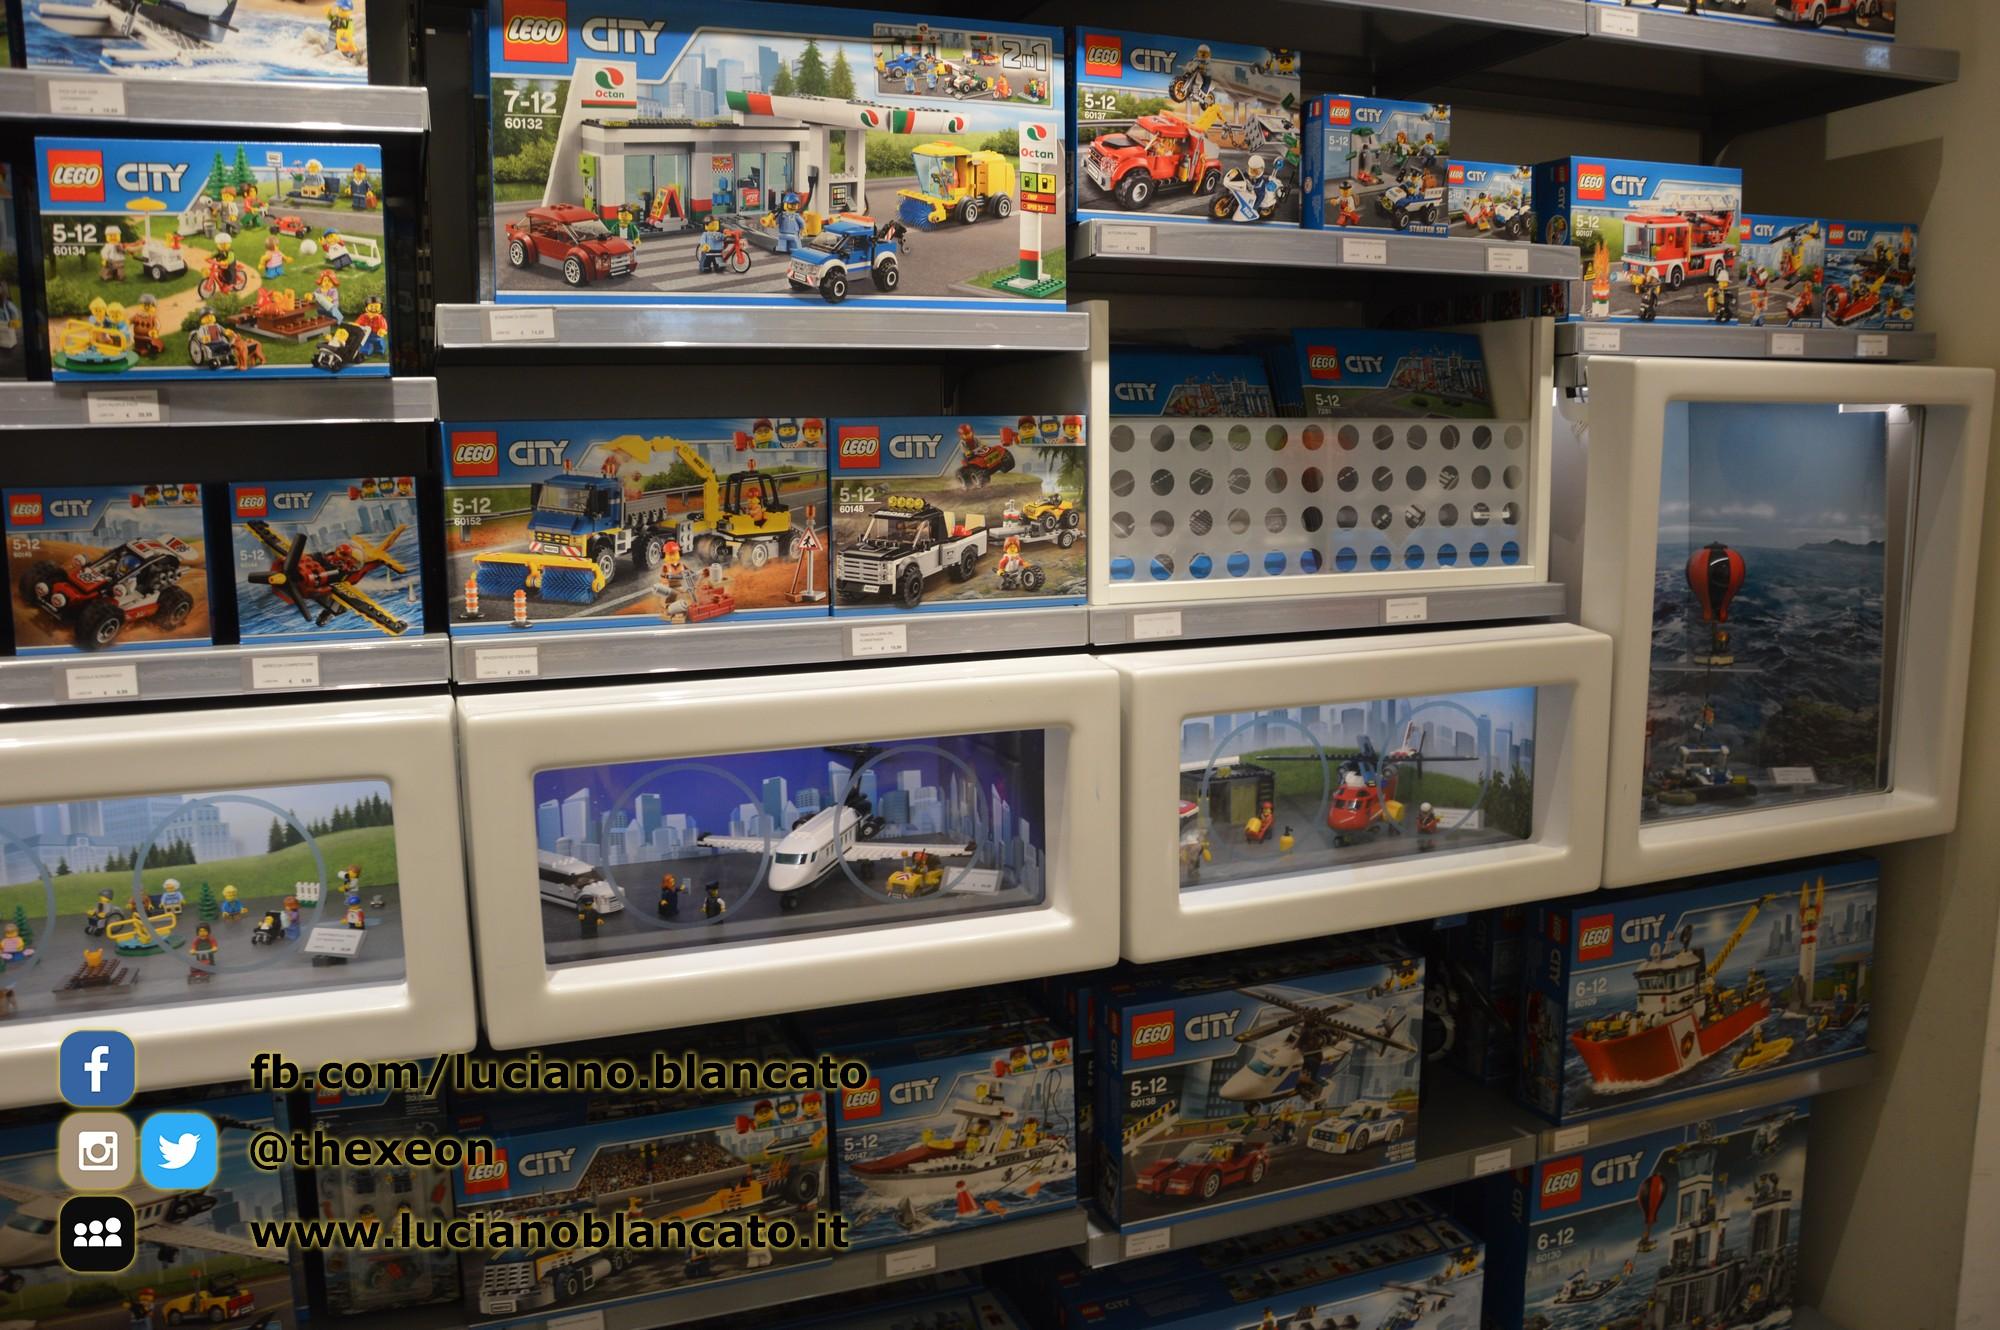 copy_Milano - Lego Store - serie CITY